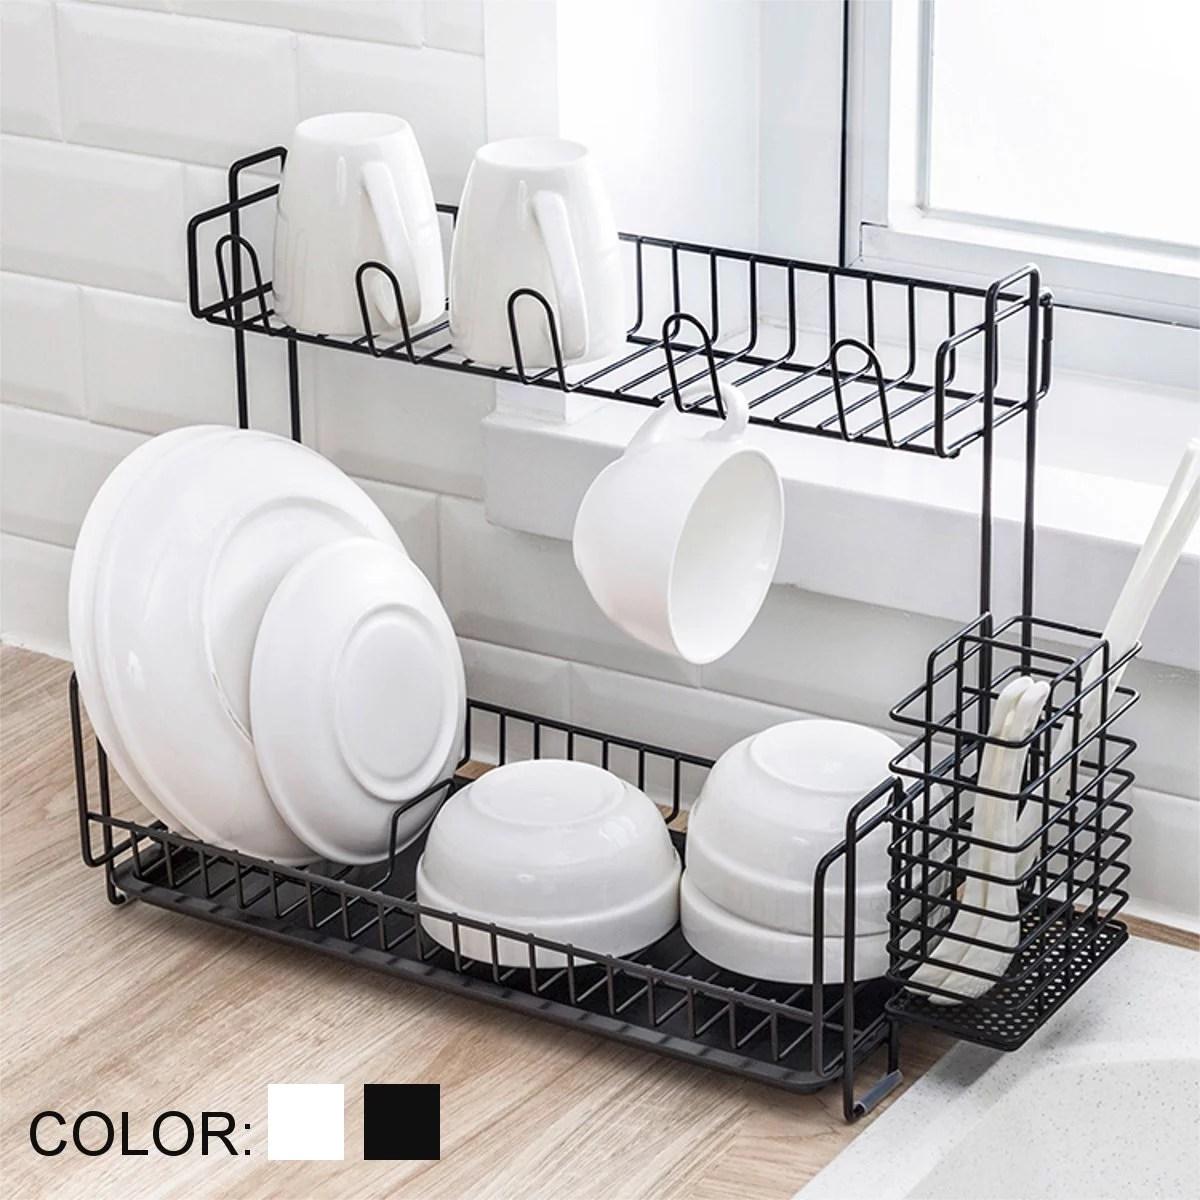 dish drying rack 2 tier large dish rack stainless steel dish drainer easy install non slip dish dryer utensil holder rustproof dish drainer